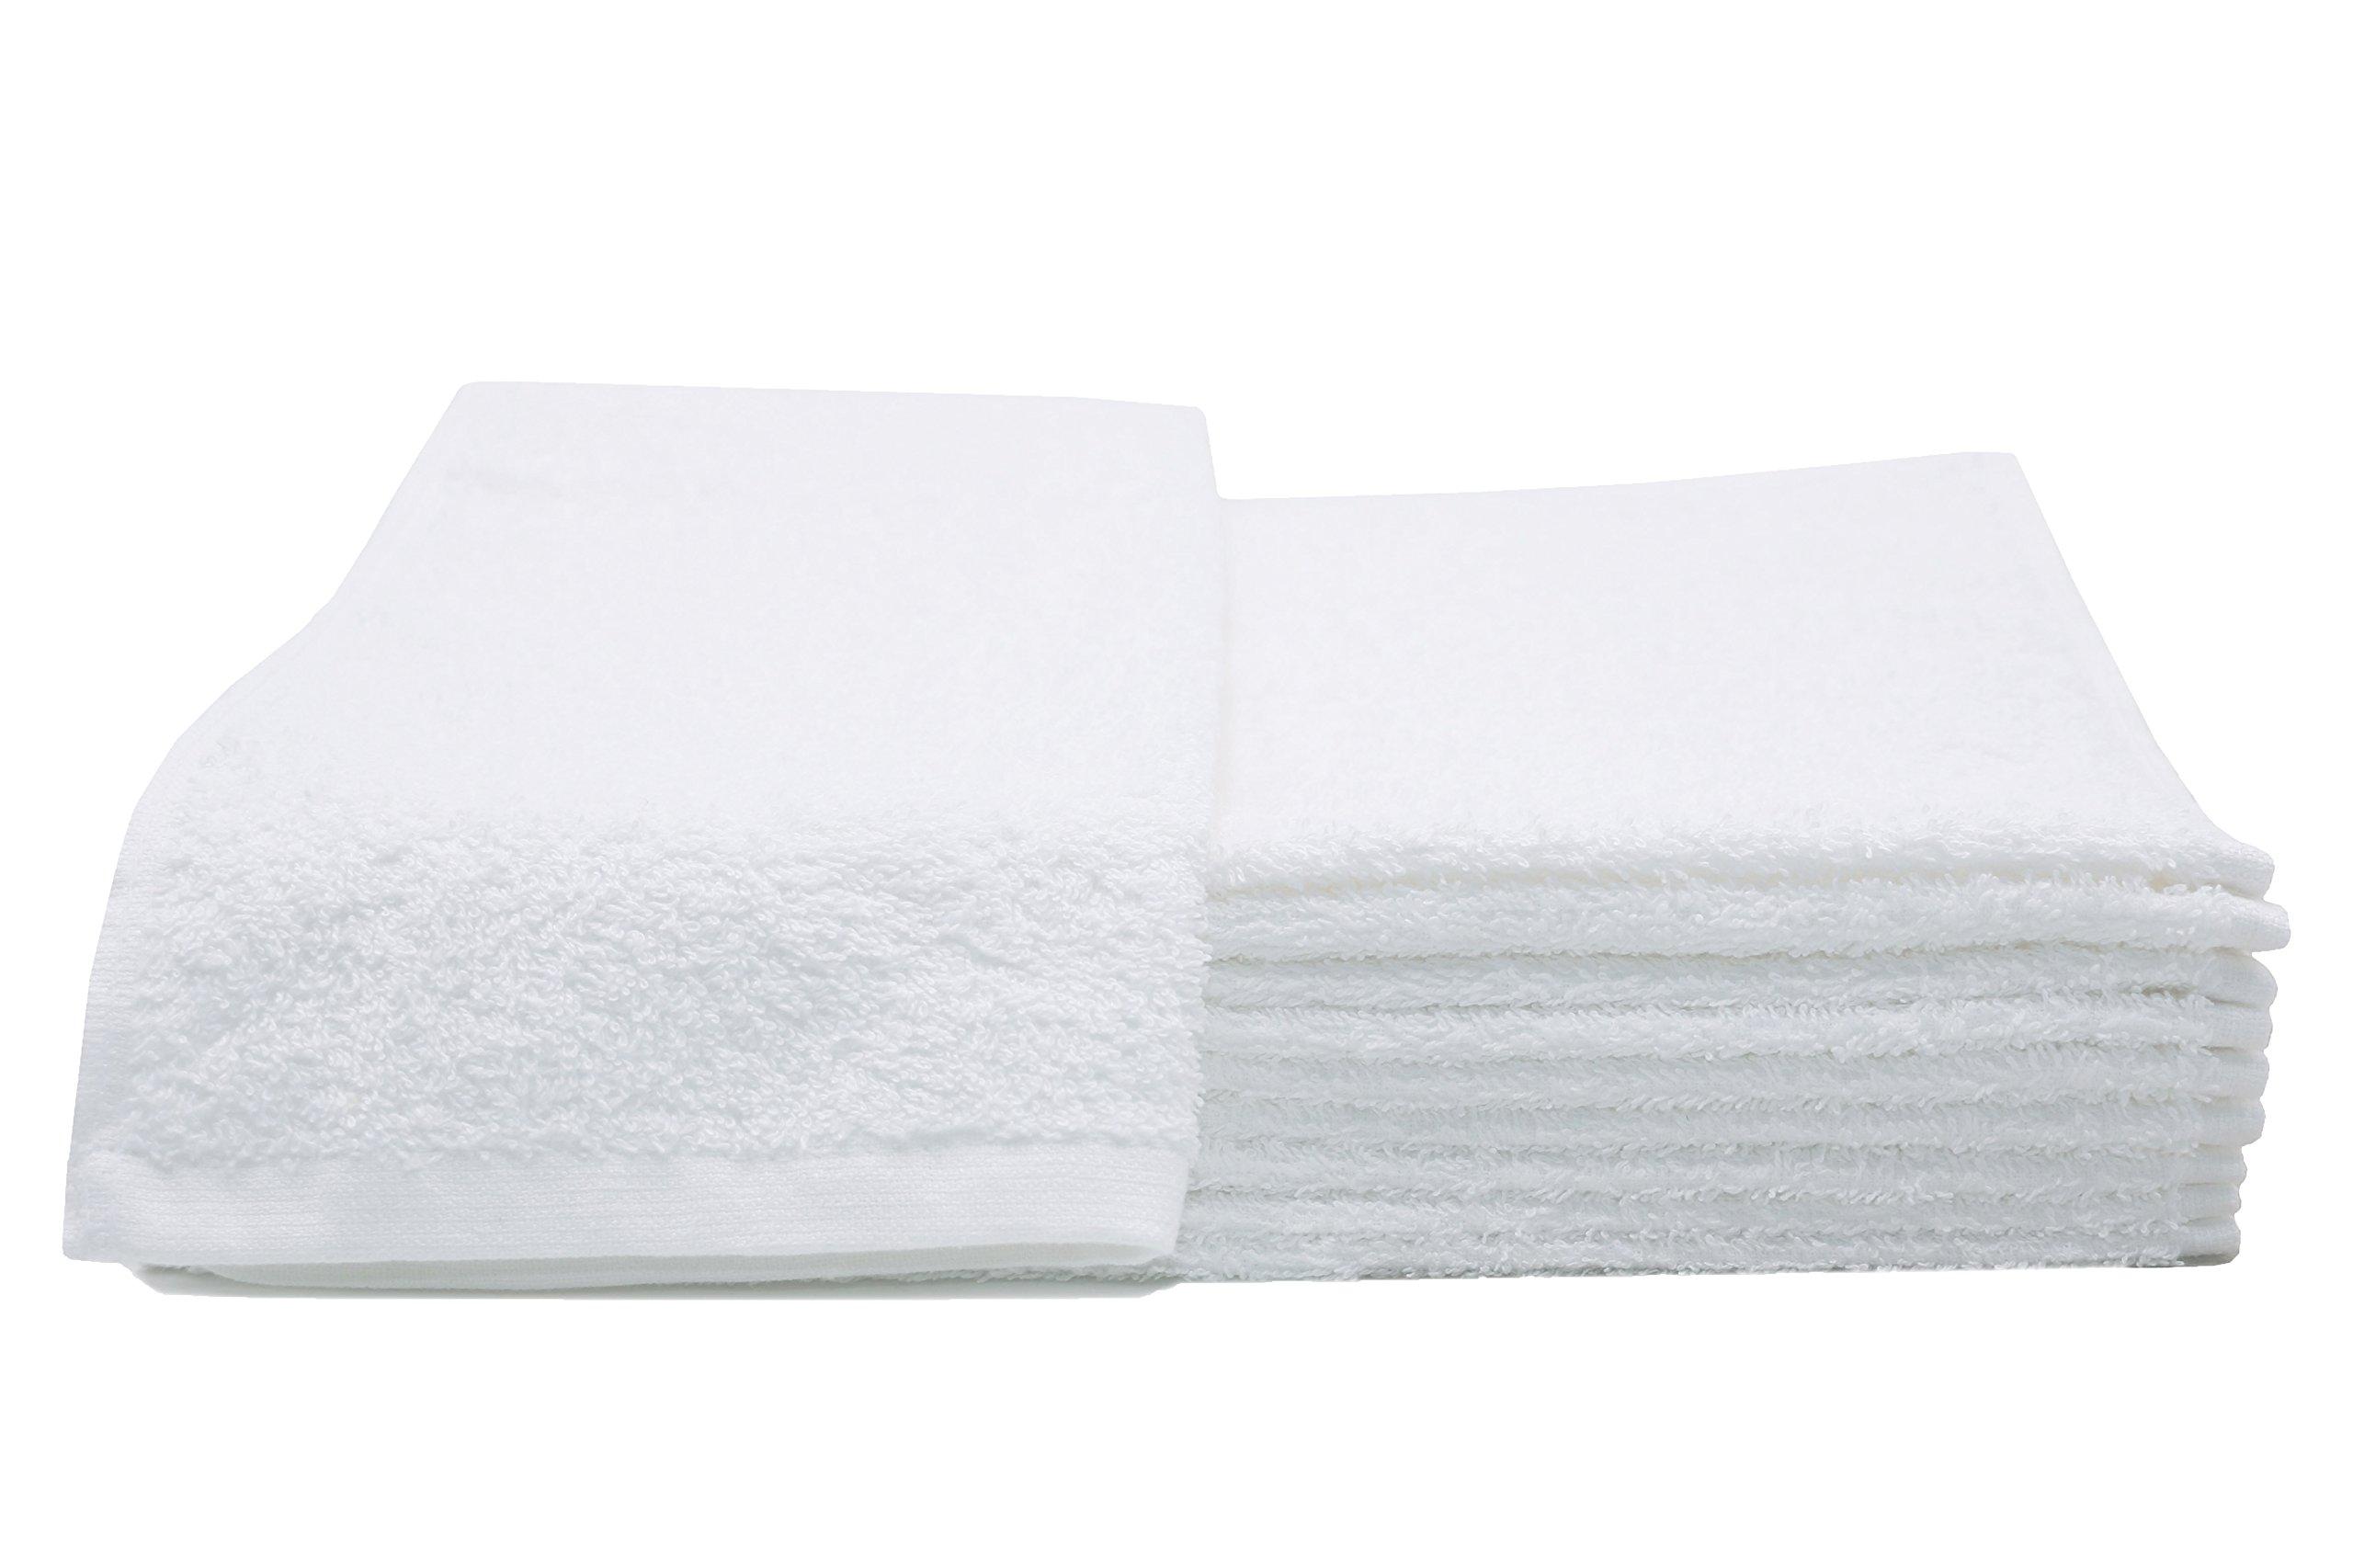 ZOLLNER 10 Toallas de tocador Blancas, 30x50 cm, algodón 100%, en Otra